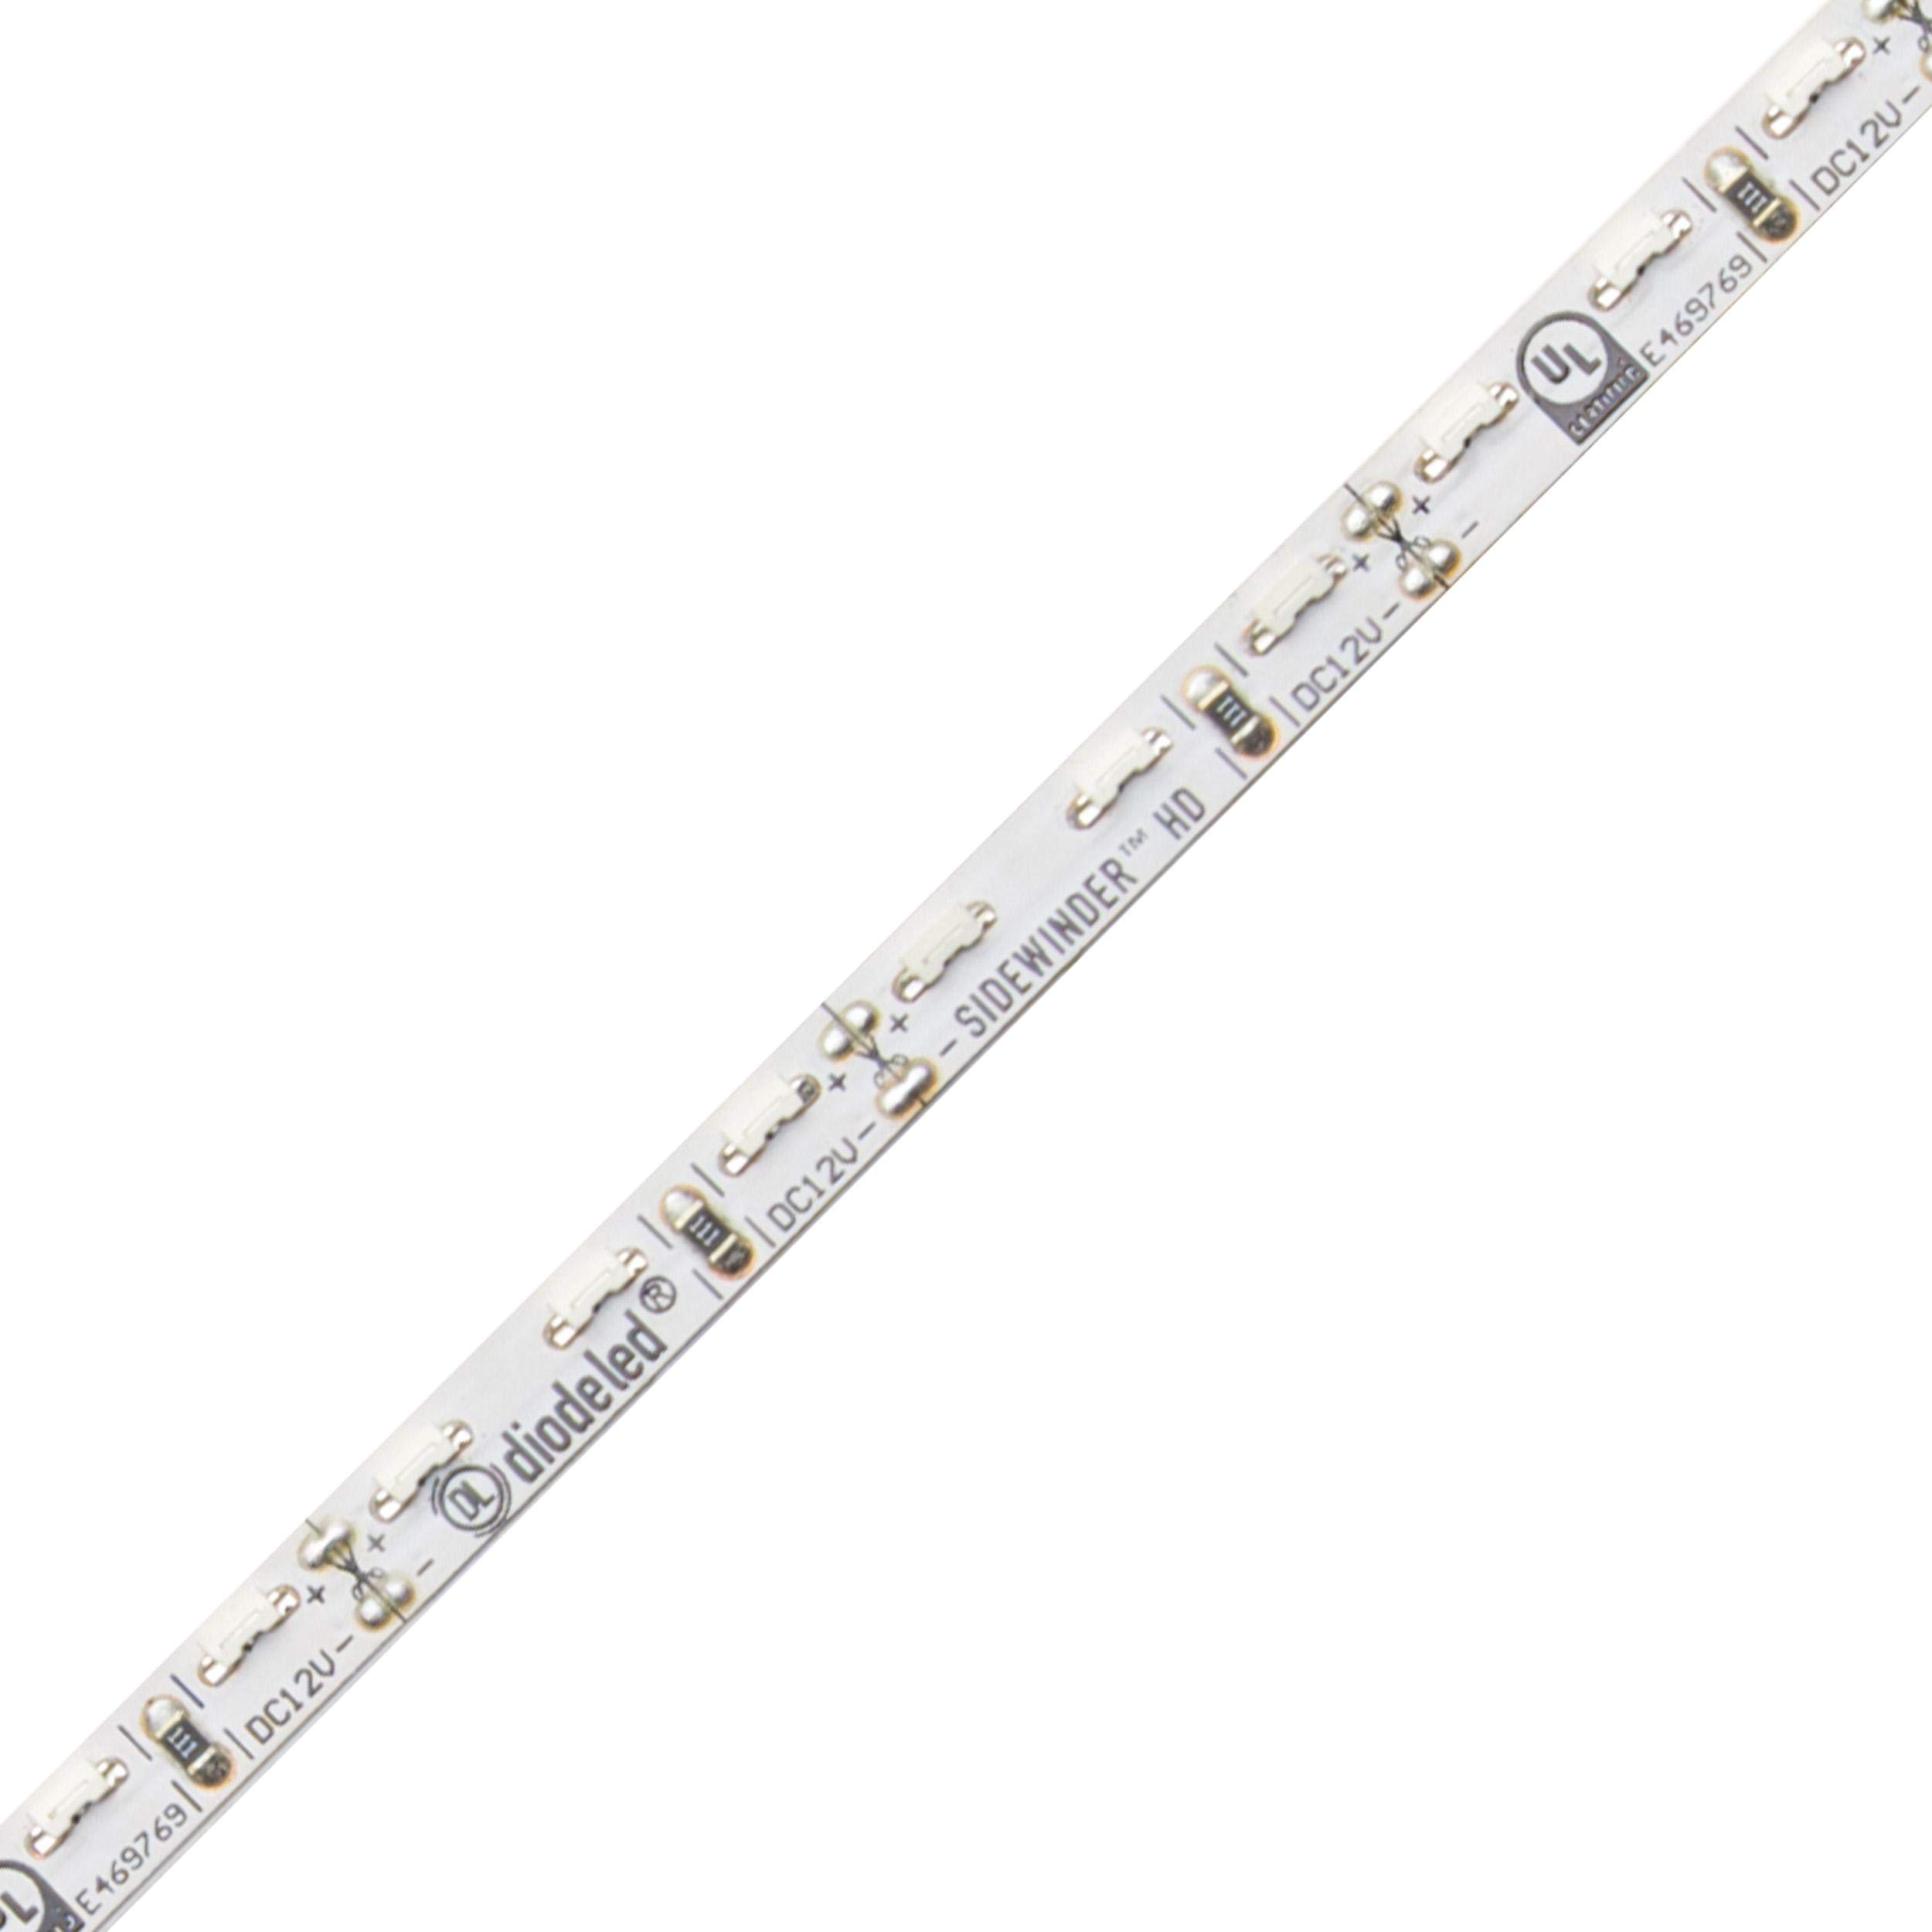 Diode LED Sidewinder High Density 12V LED Tape Light 70 CRI 3000K 16.4ft 2.88W/ft